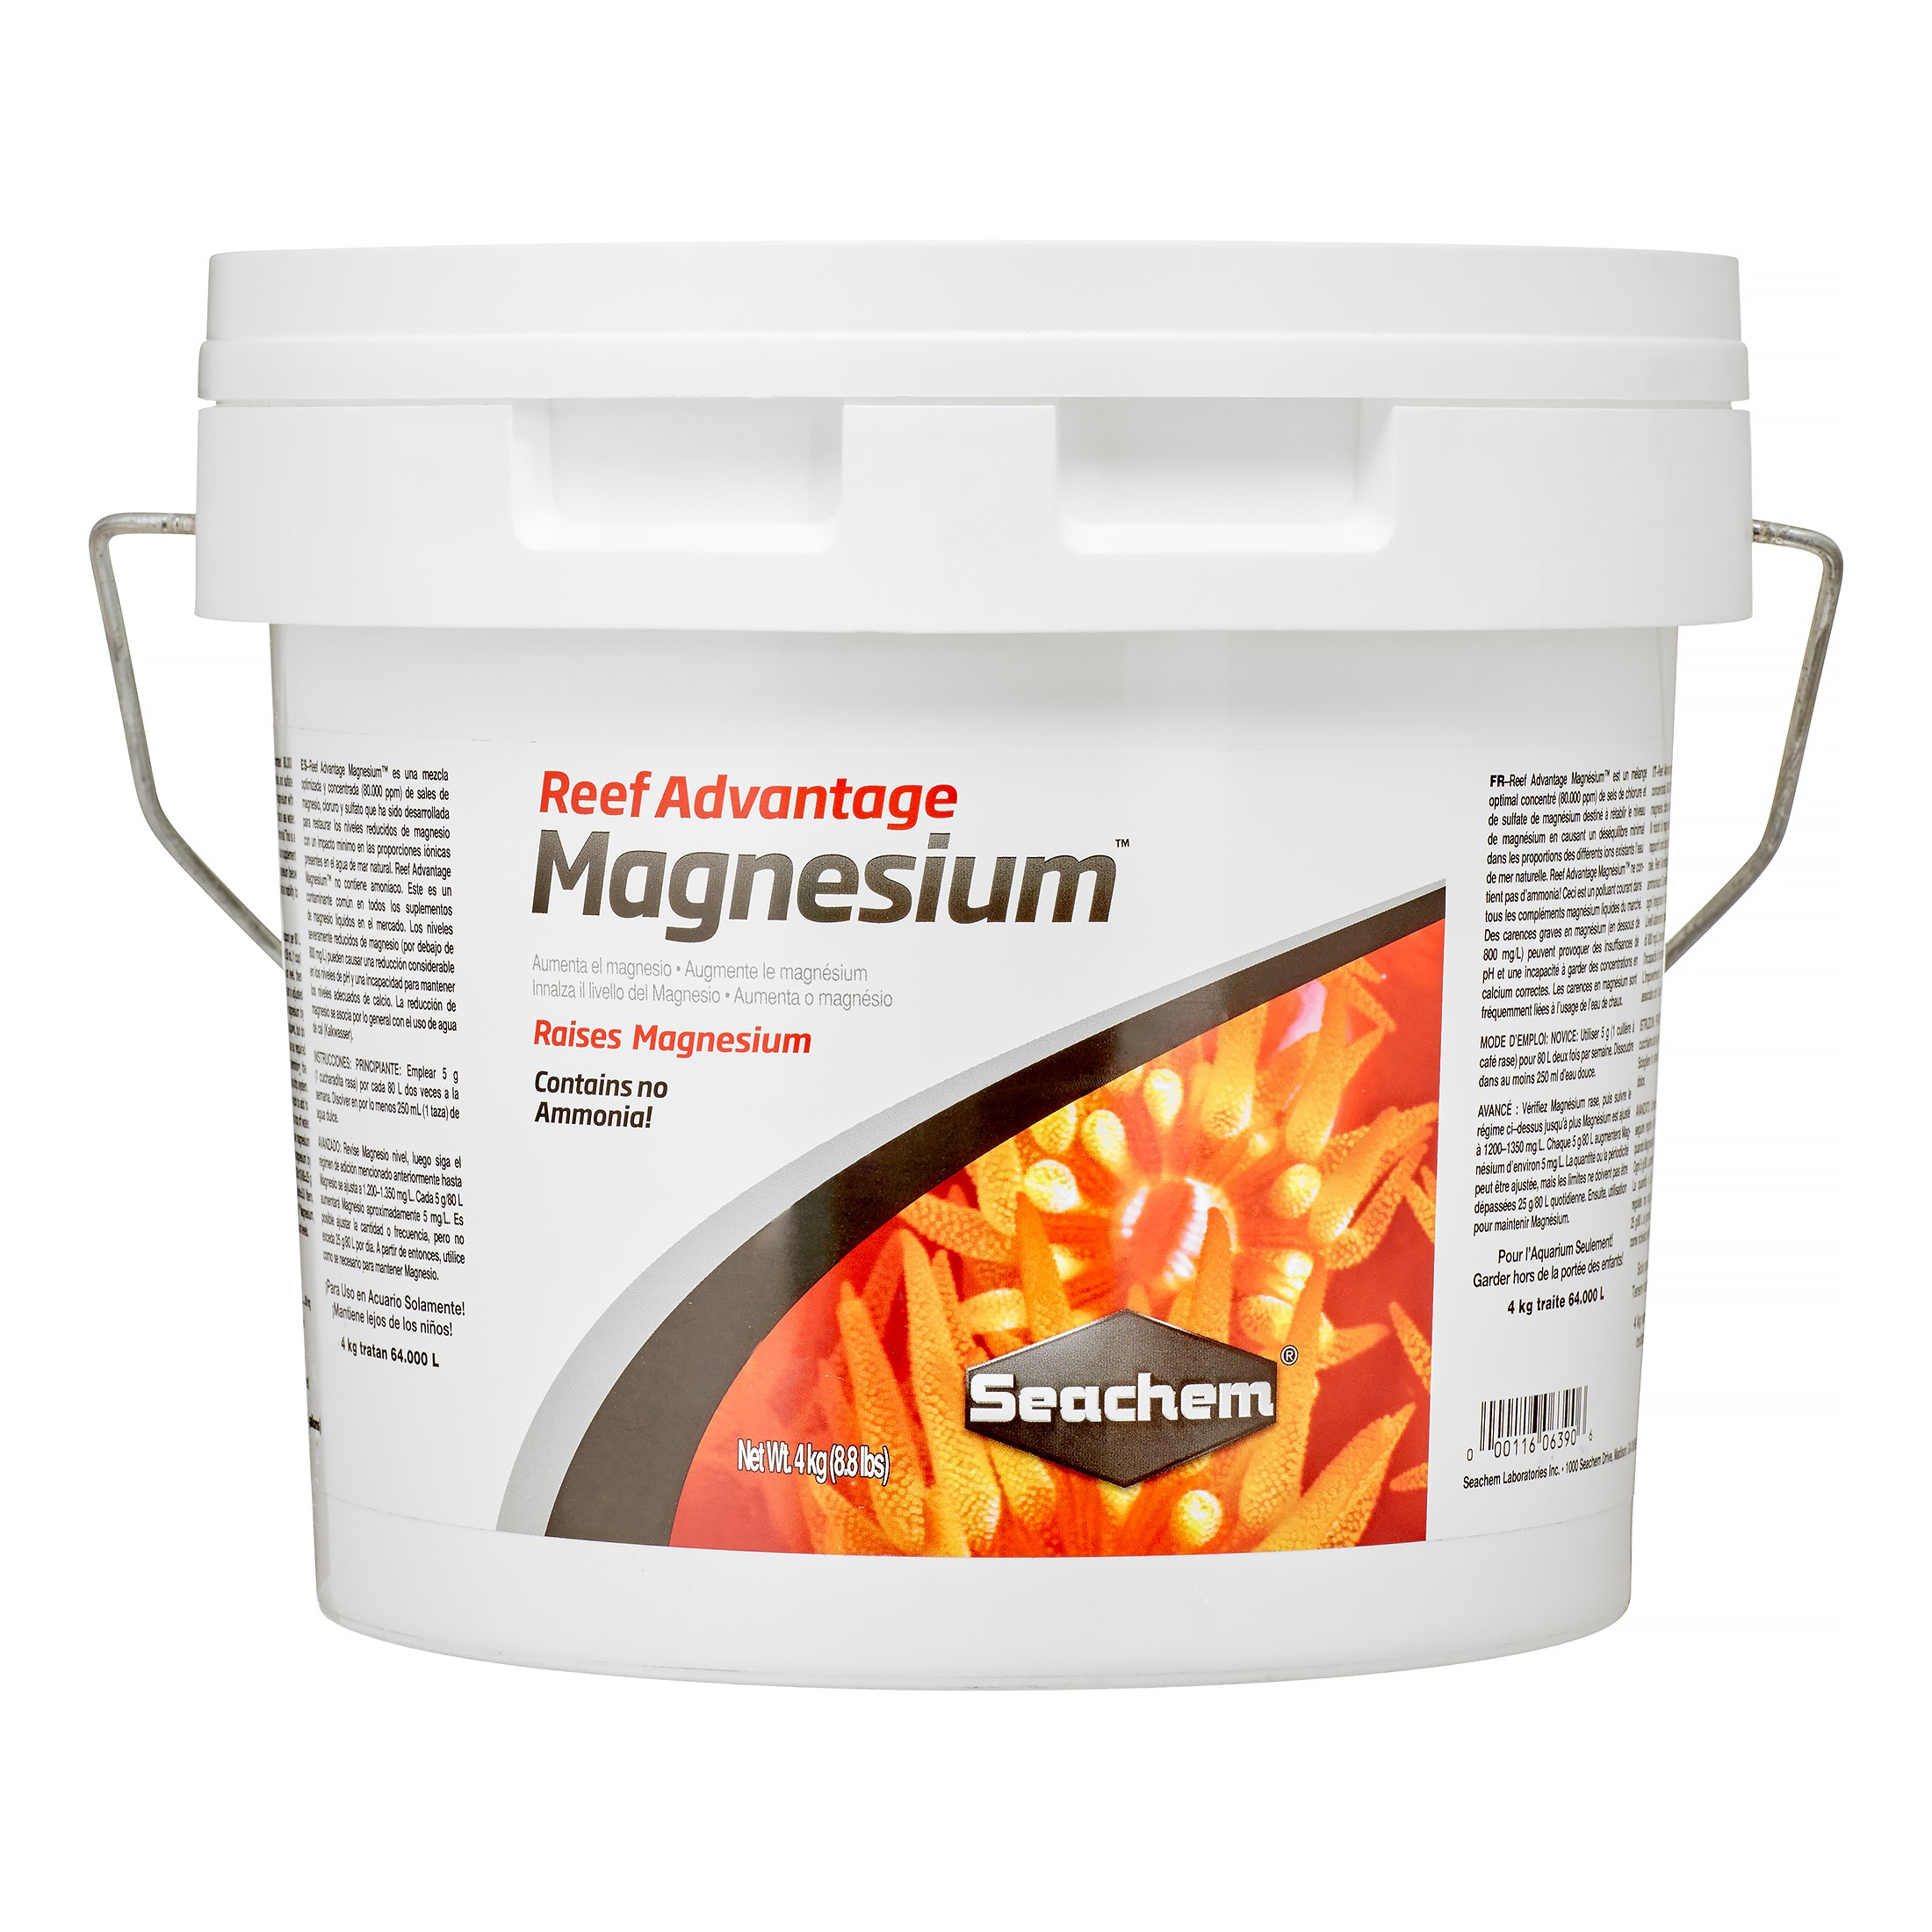 Seachem Reef Advantage Magnesium Fish & Aquatic Life Reef Water Treatment, 8.8 Lb